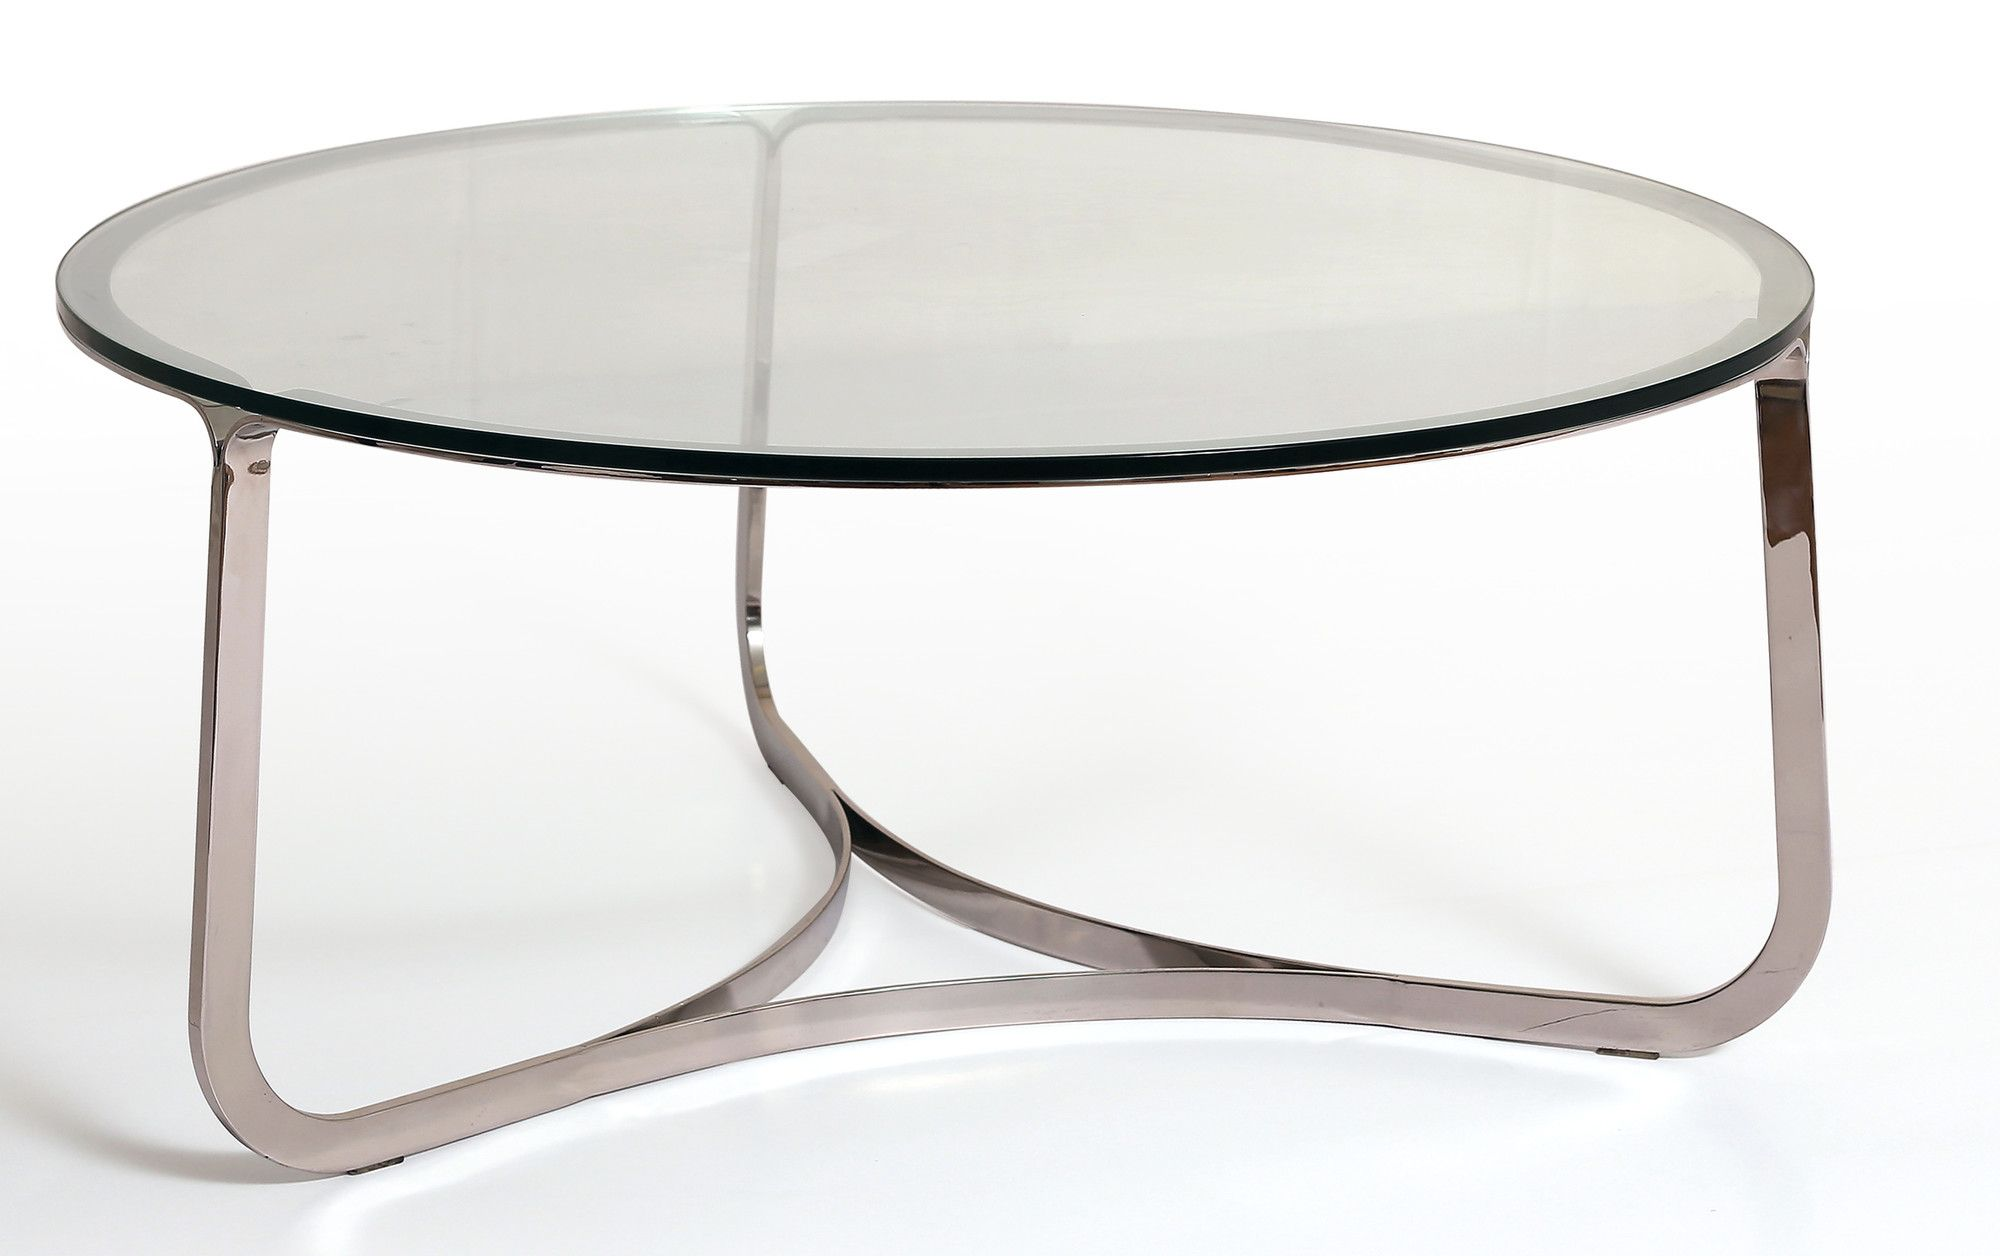 Bellini Modern Living Blake Coffee Table Coffee Table Contemporary Glass Coffee Tables Glass Coffee Table [ 1256 x 2000 Pixel ]